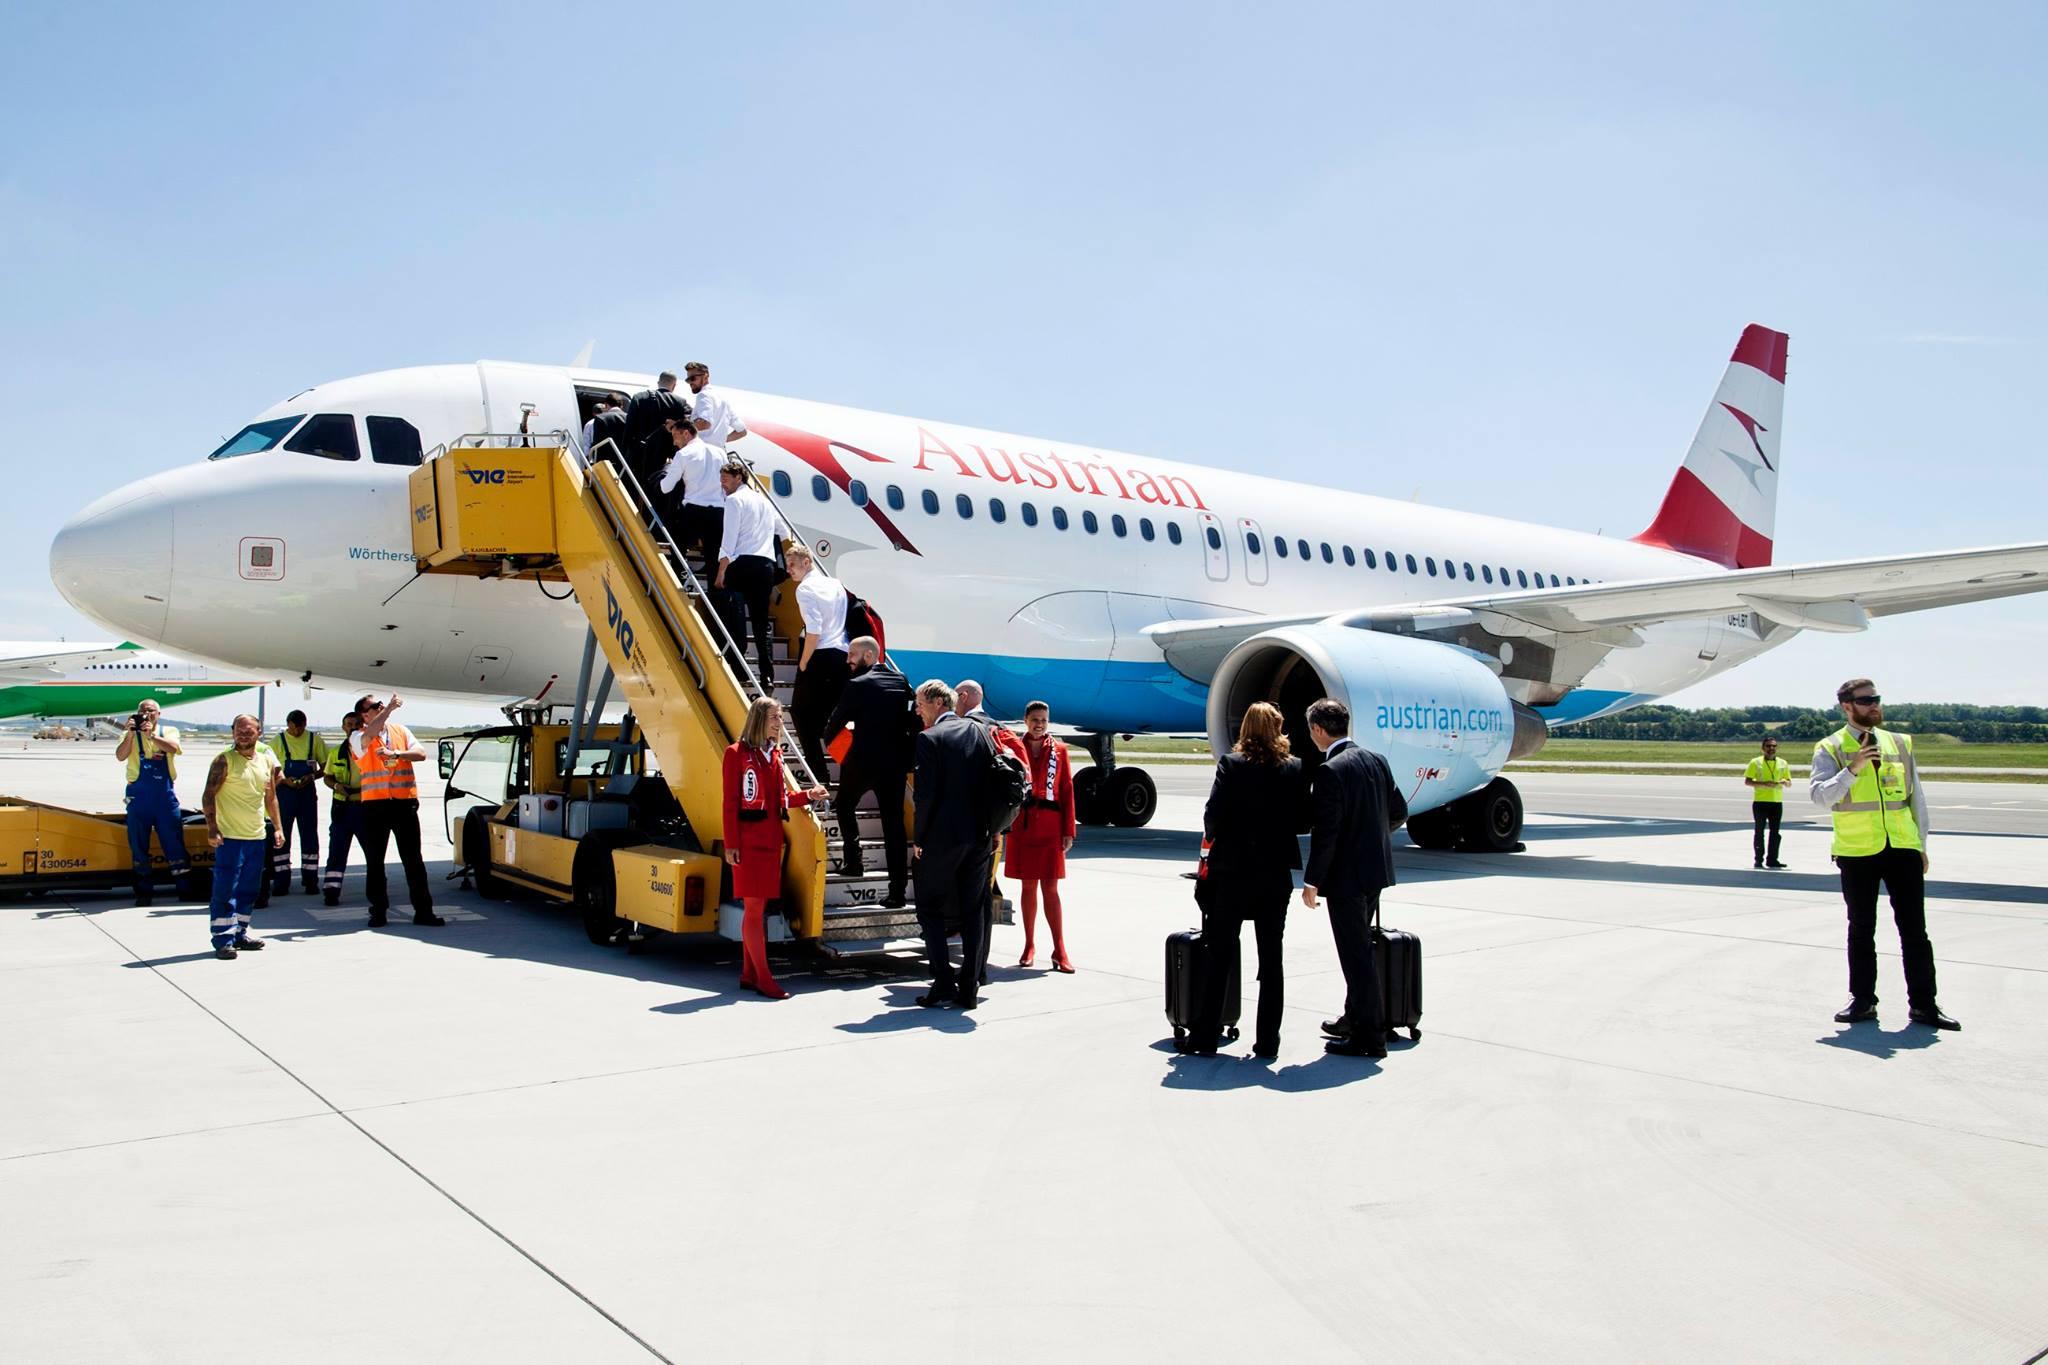 Austrian Airlines vil åbne ny rute til Shiraz i Iran. (Foto: Austrian)